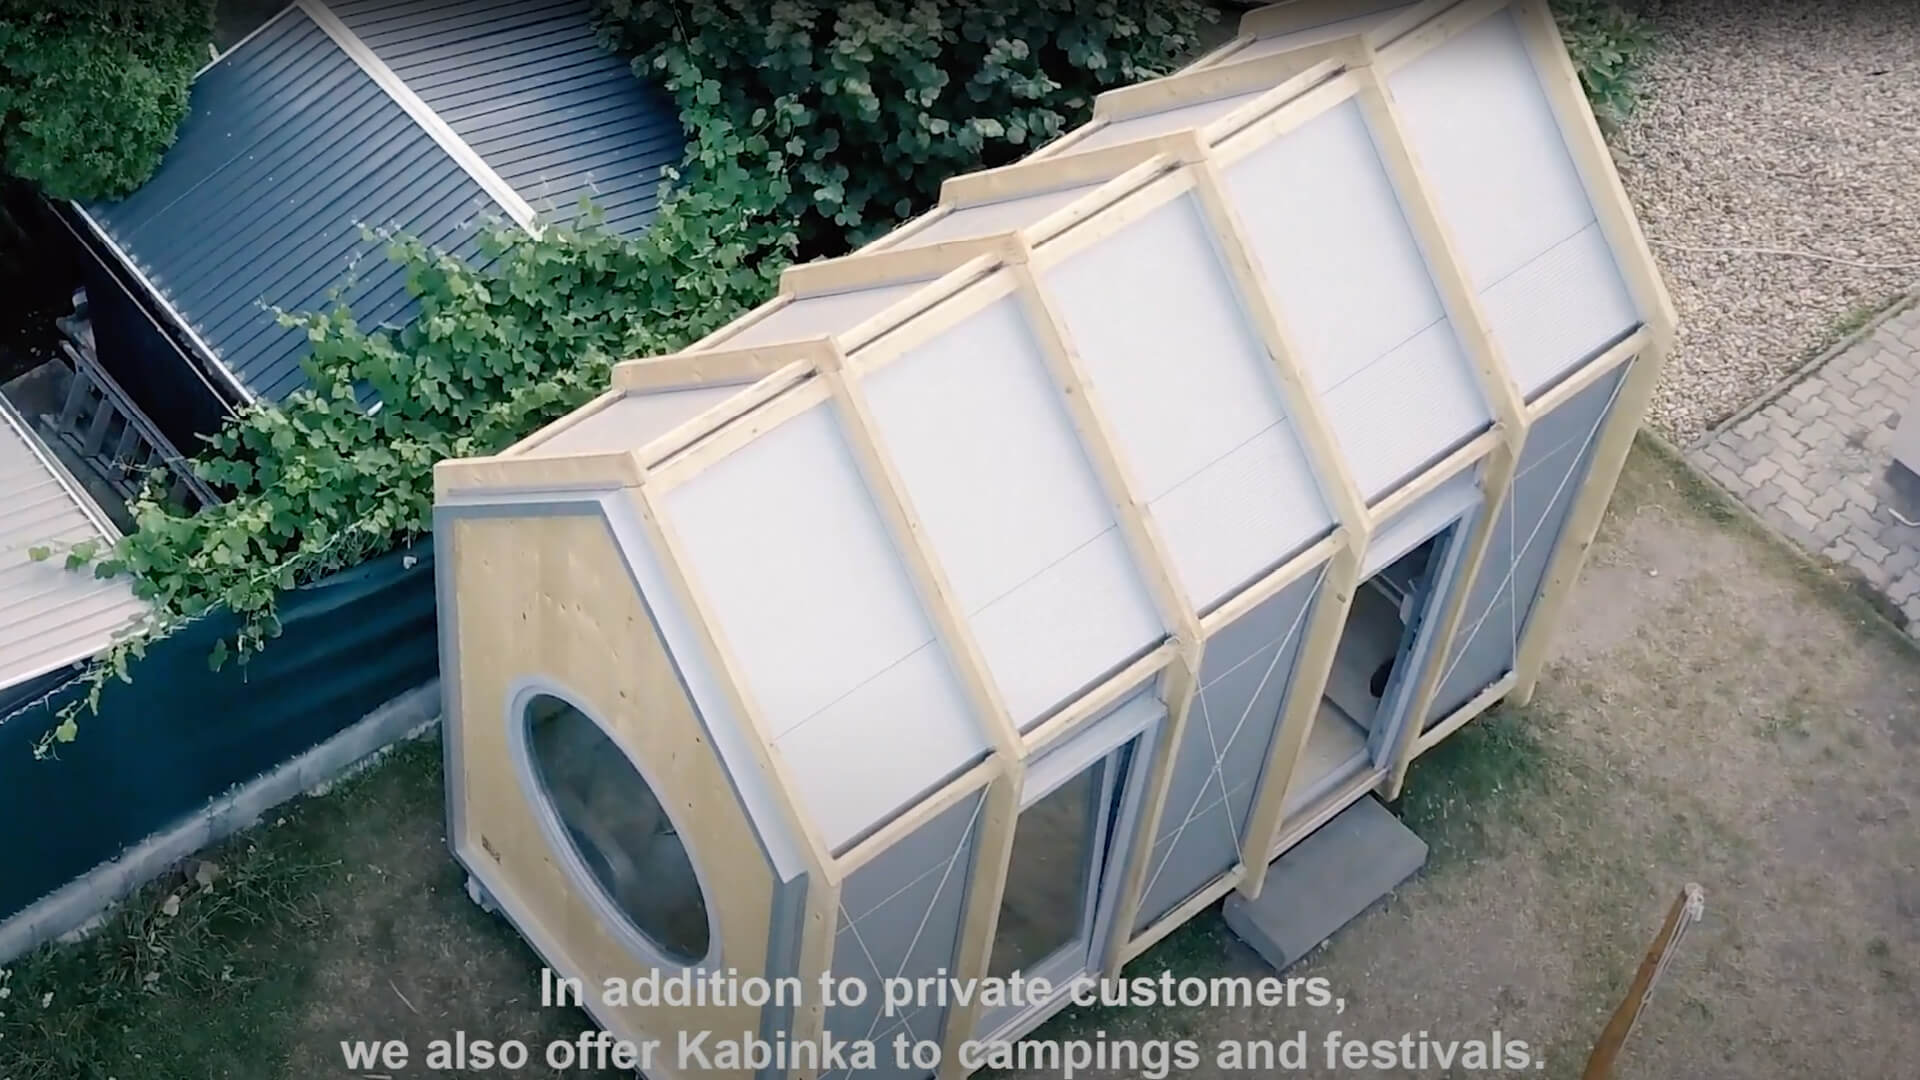 Kabinka, a small cabin designed by Hello Wood in Hungary | Kabinka |Hello Wood| STIRworld